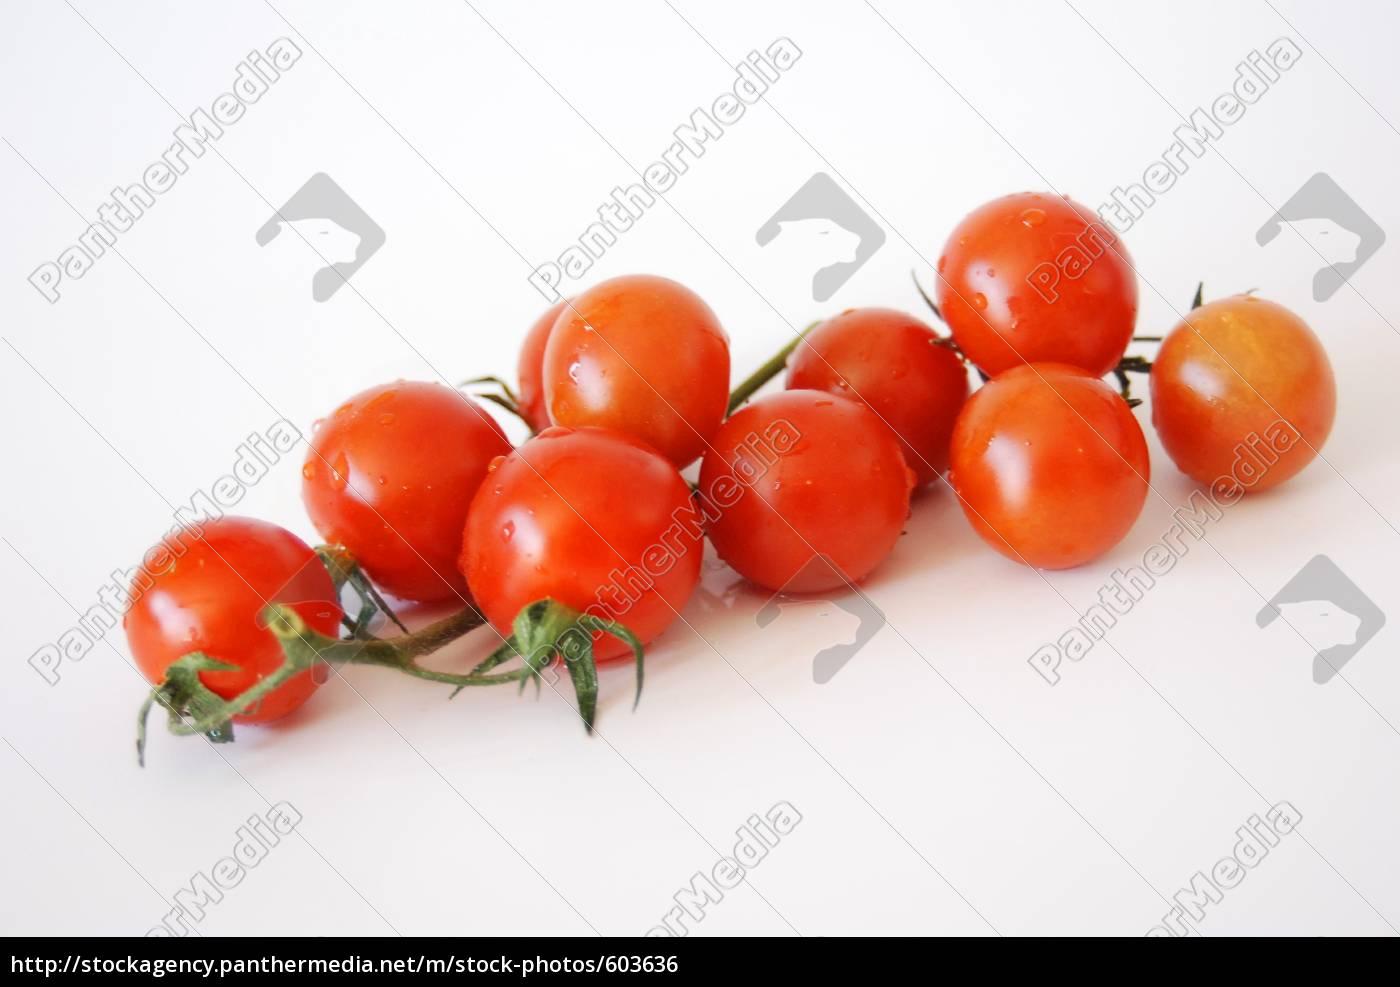 tomatoes - 603636